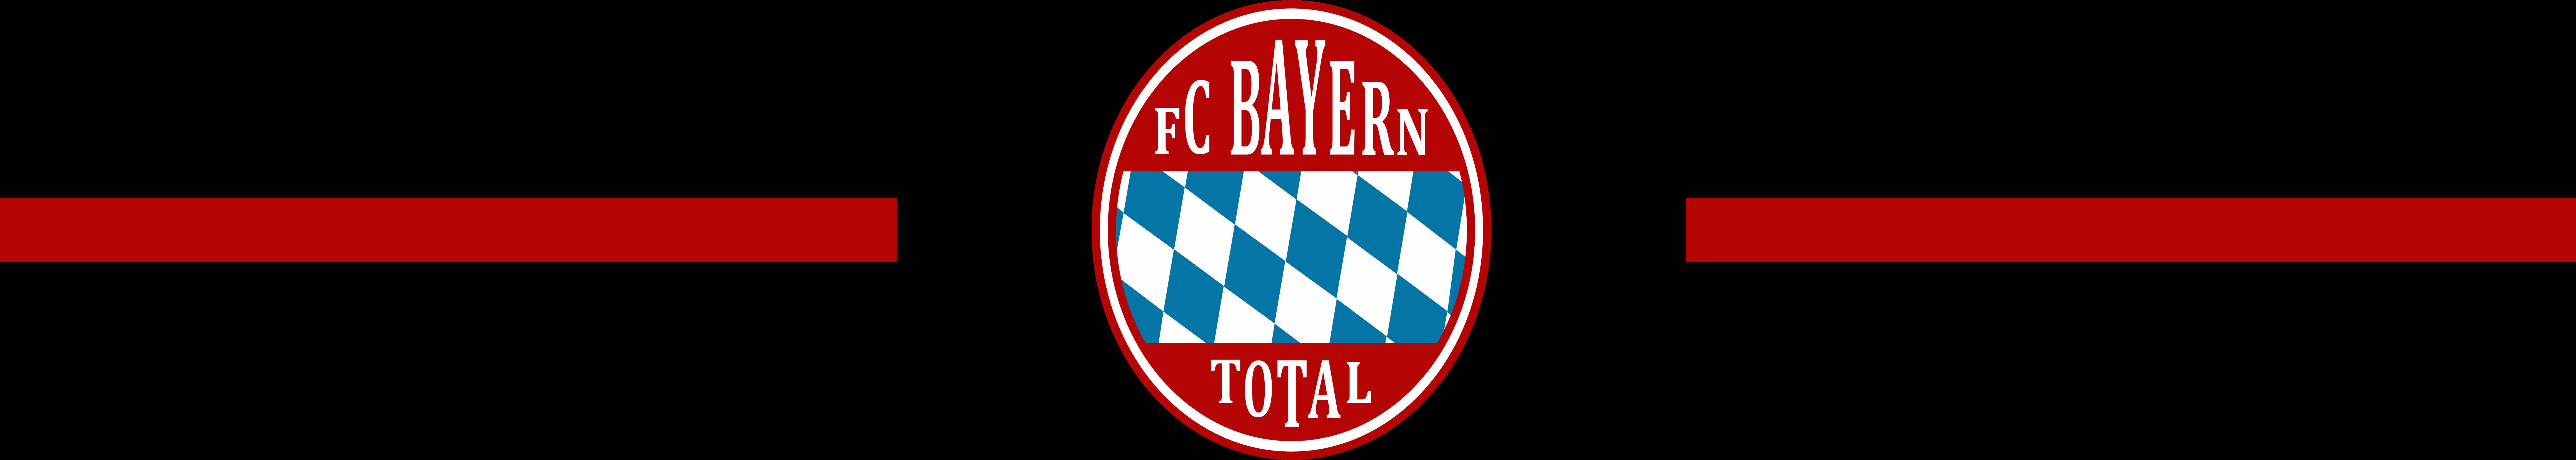 FC Bayern Total